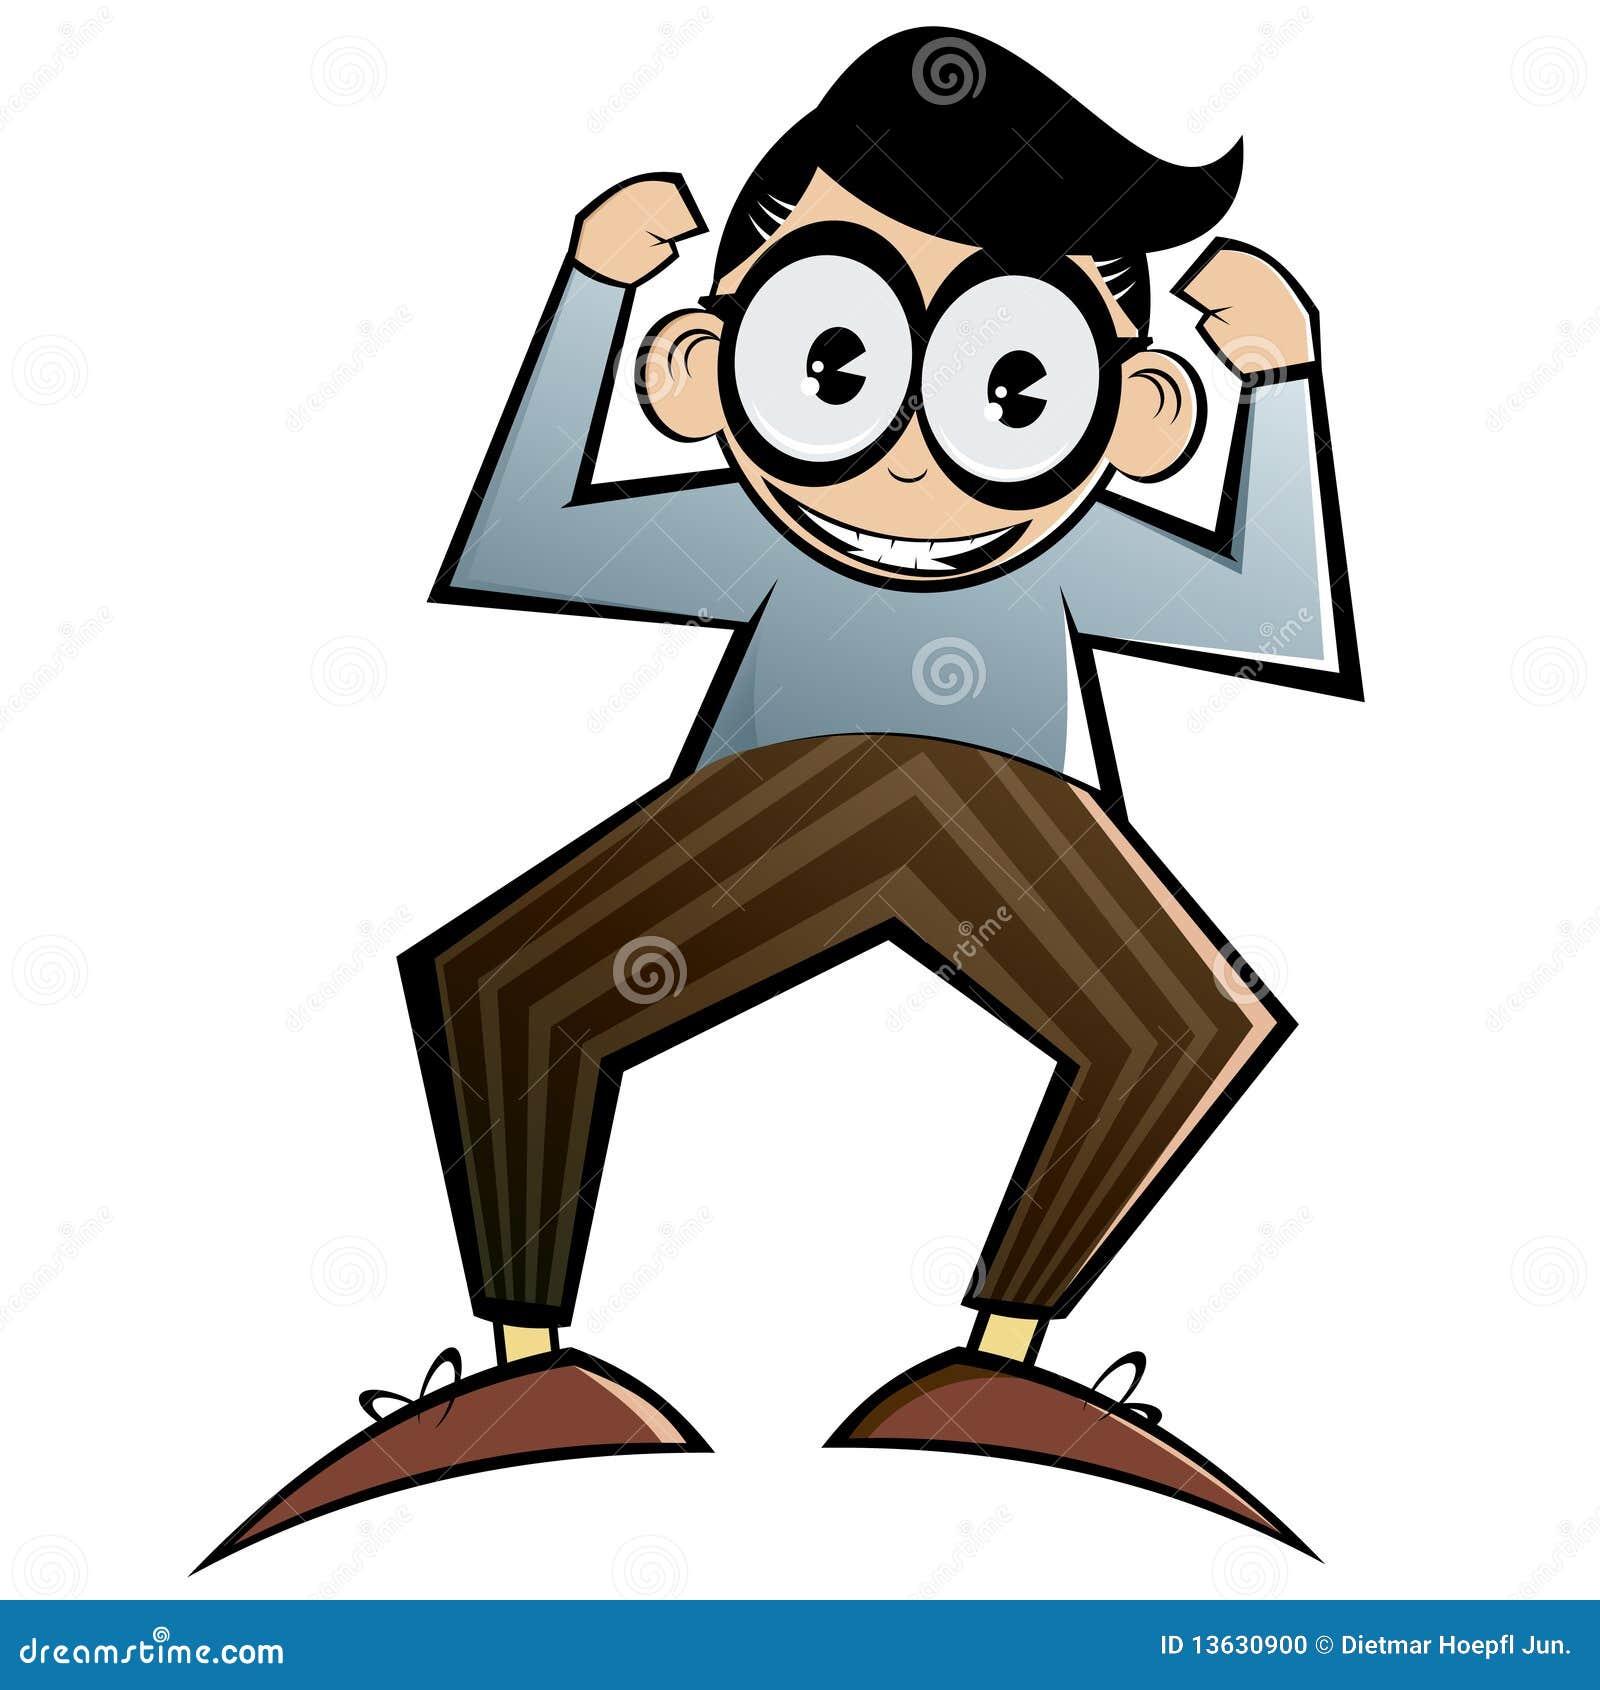 Cartoon Characters Glasses : Cartoon nerd with glasses stock photo image